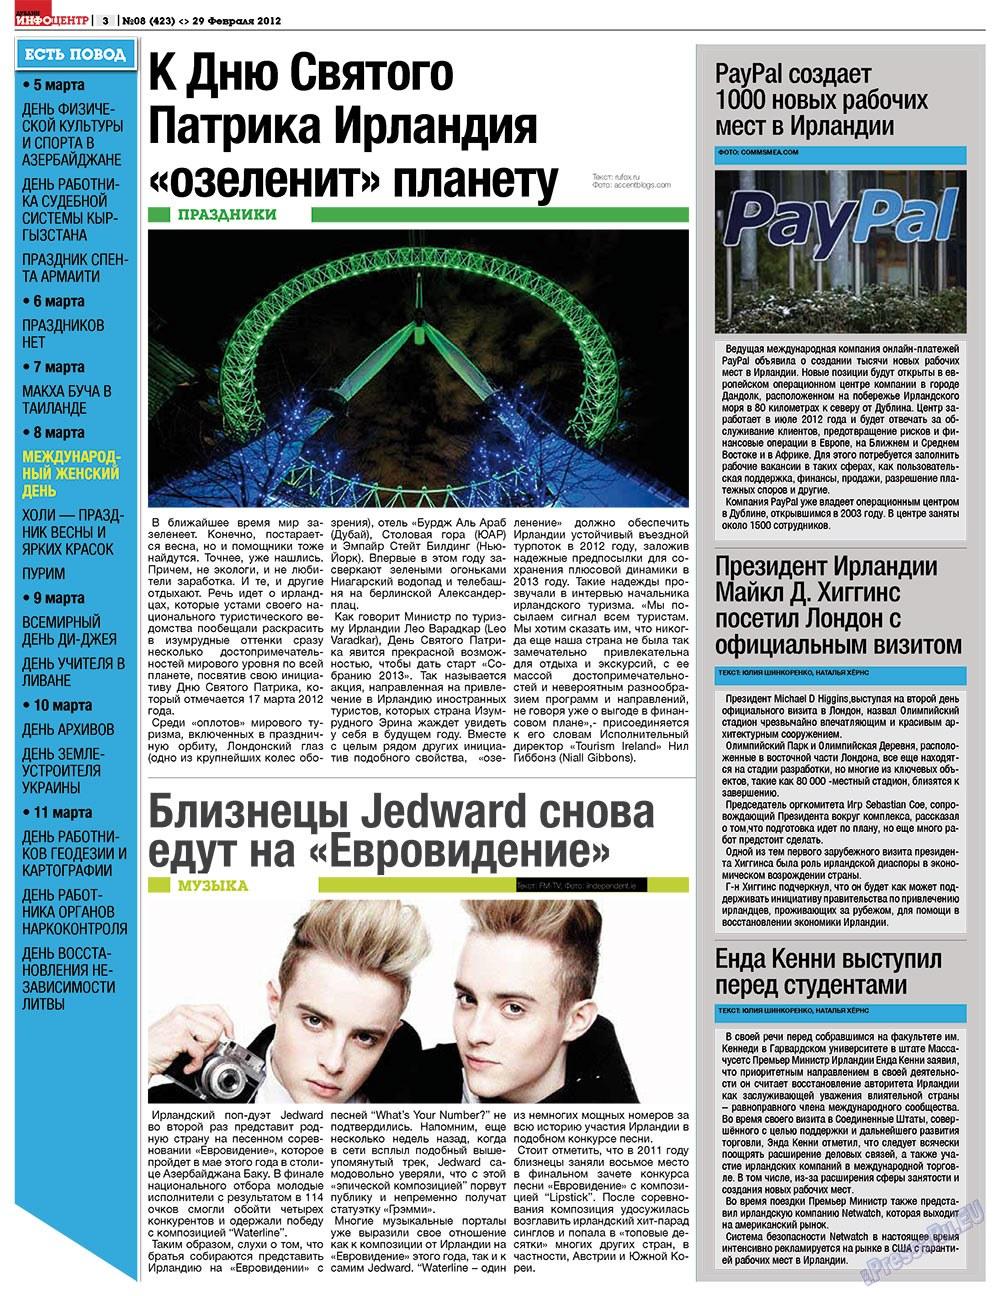 Дублин инфоцентр (газета). 2012 год, номер 8, стр. 3